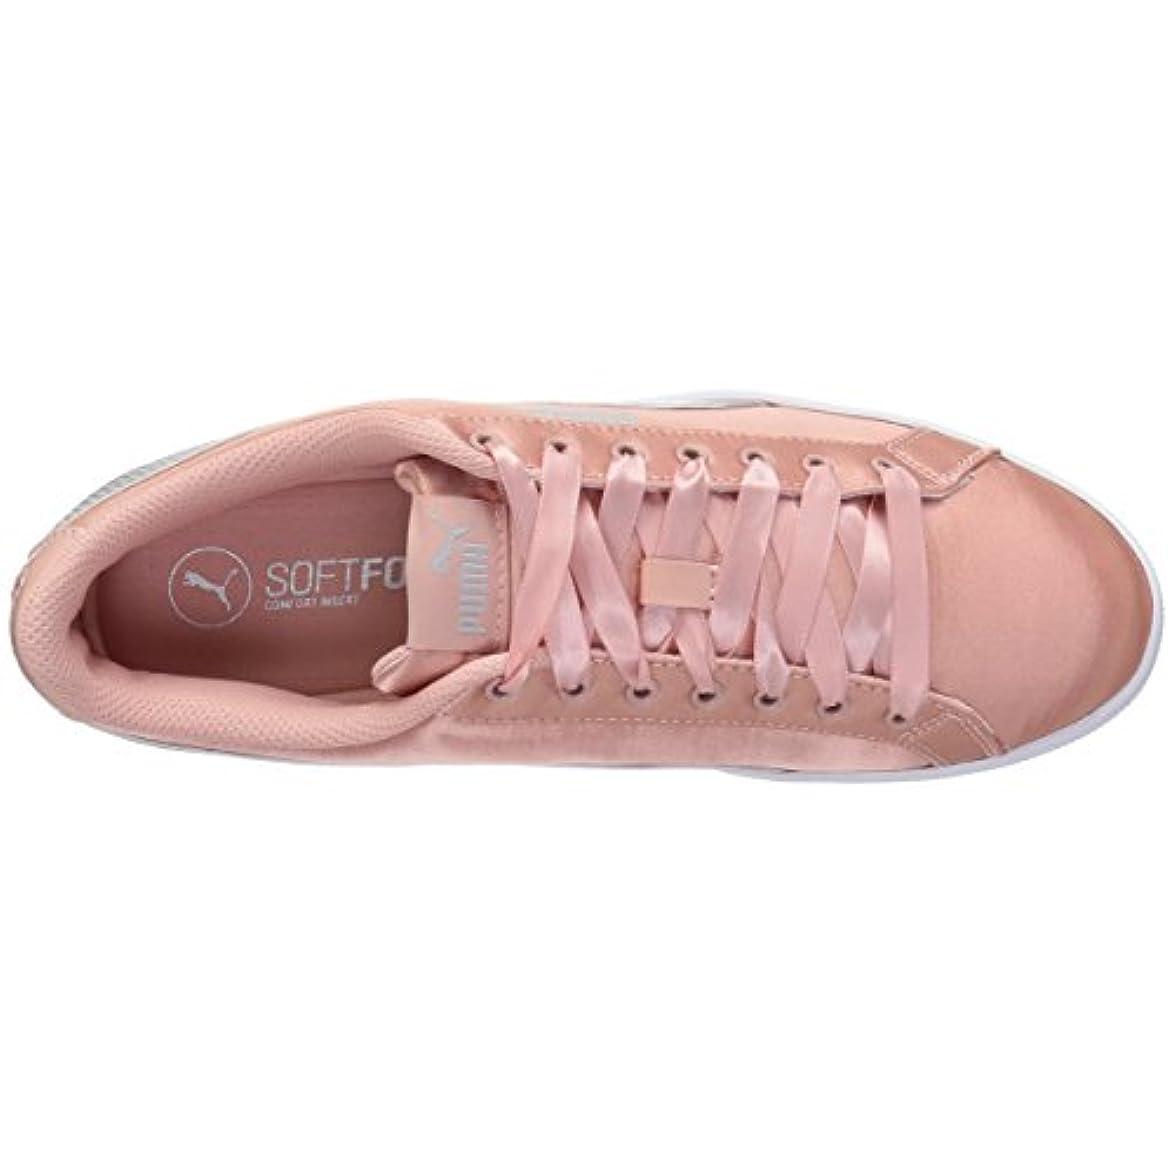 Pumapuma-366456 - Puma Vikky En Pointe Donna Rosa peach Beige-puma Silver 38 5 Eu